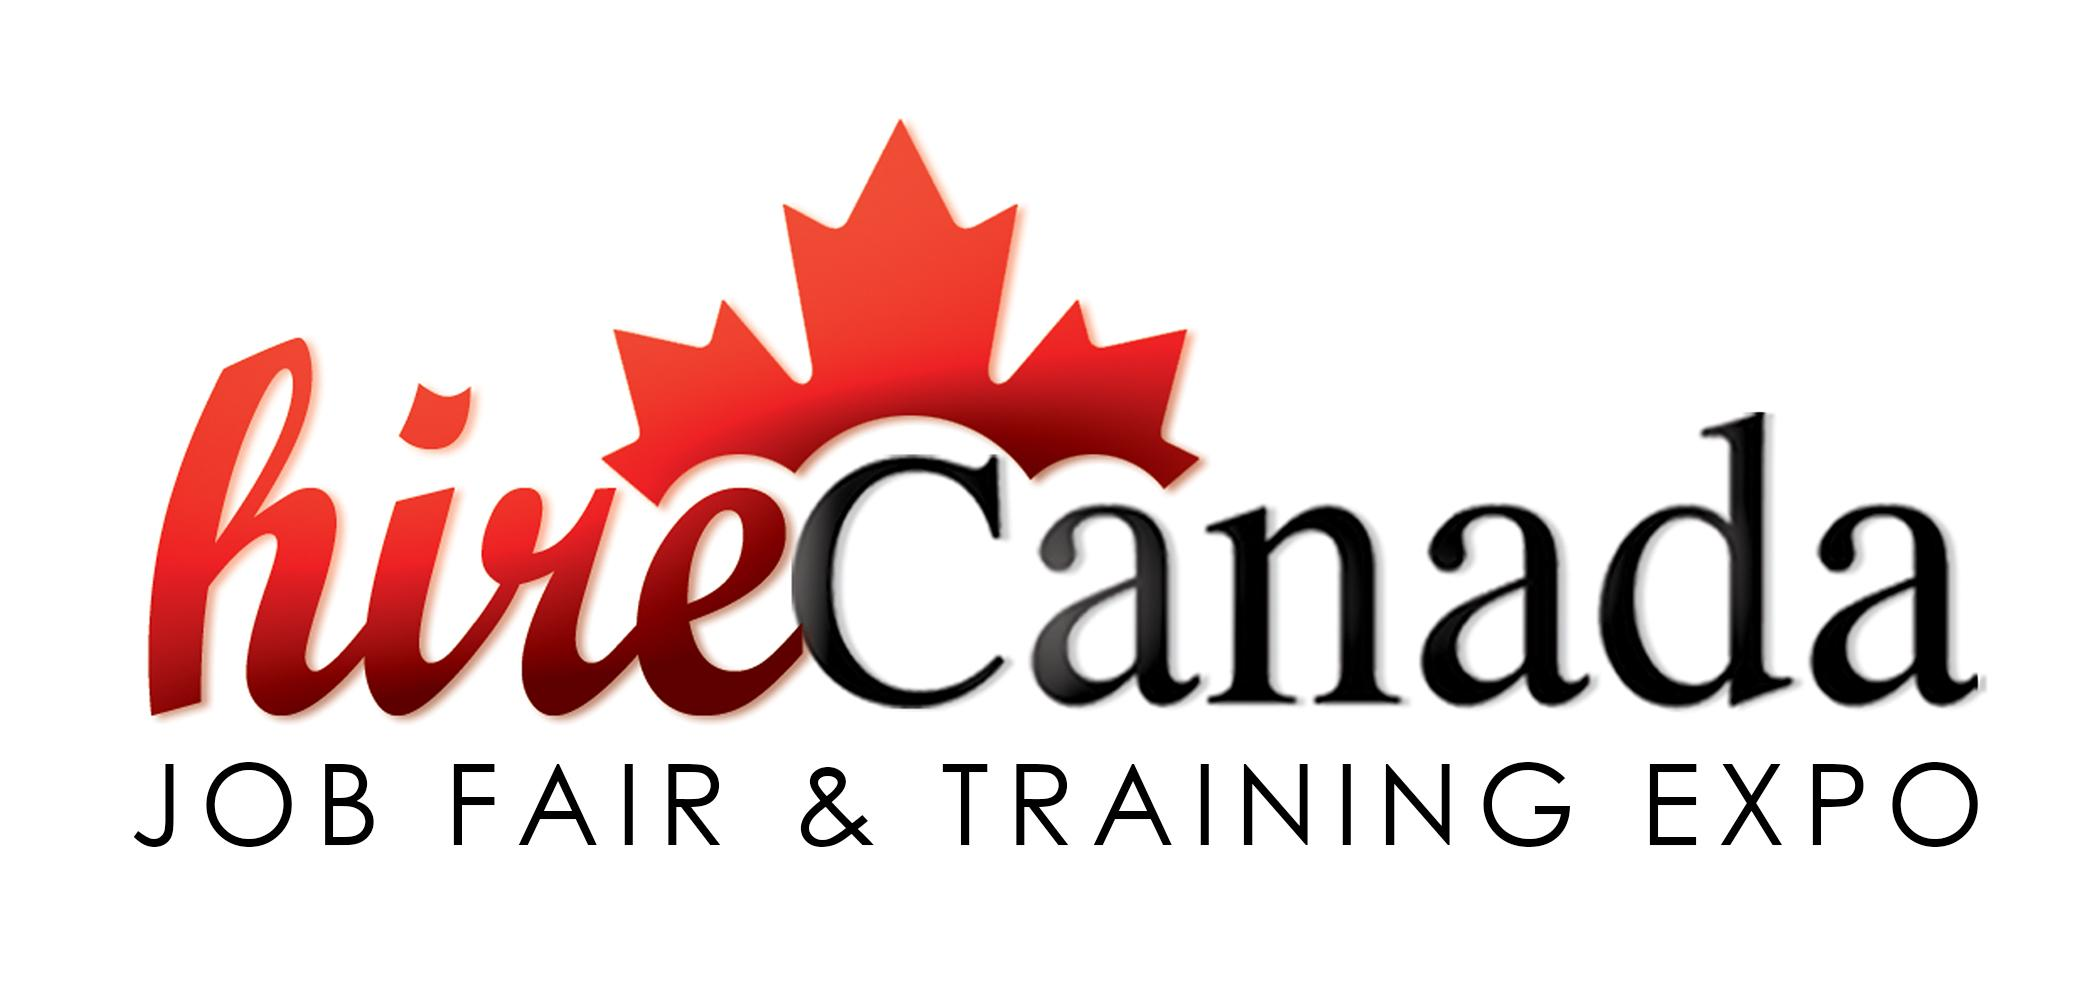 Hire Canada Job Fair & Training Expo - Summer